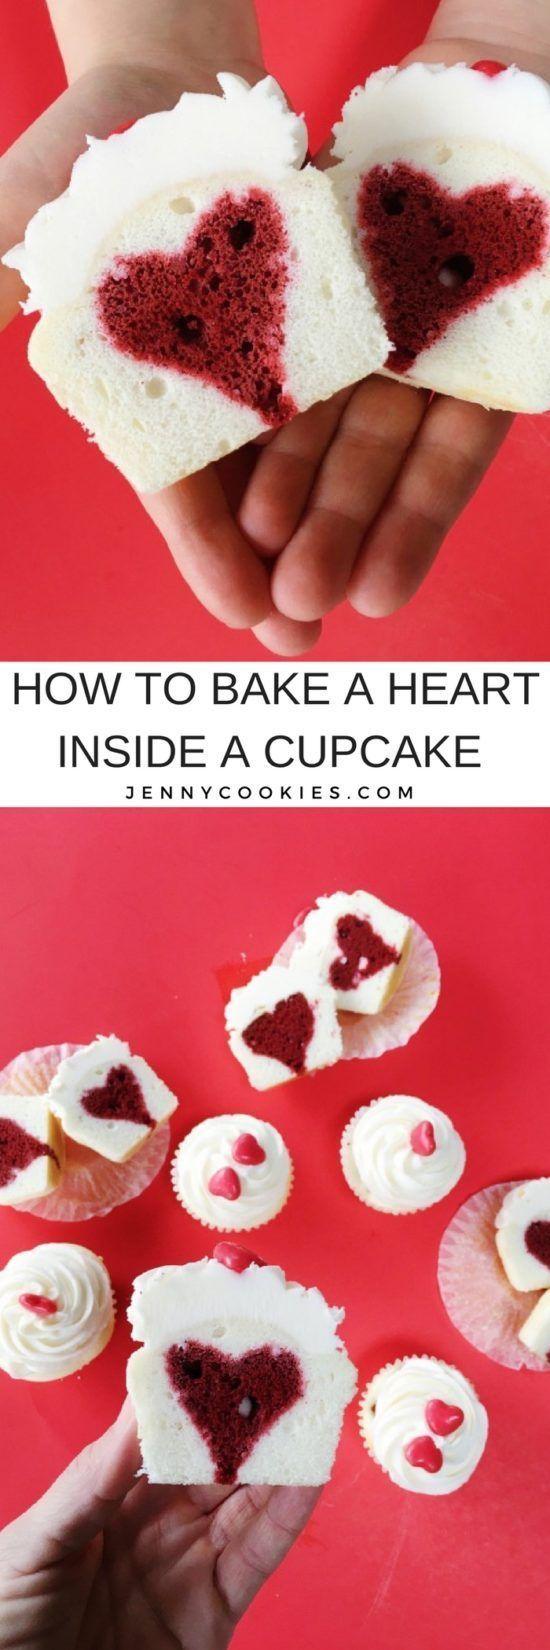 How to Bake a Heart Inside a Cupcake | heart cupcake tutorial | heart cupcake recipes | Valentine's Day cupcake recipes | easy cupcake tutorials | heart inspired dessert recipes || JennyCookies.com #heartcupcakes #valentinesday #caketips